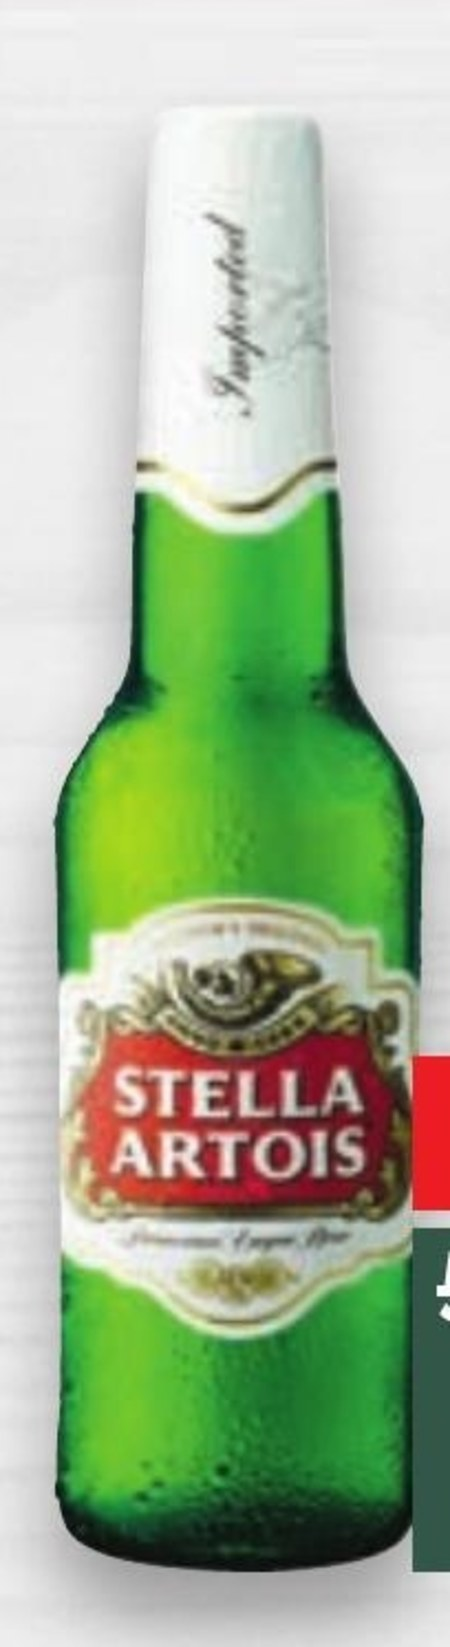 Piwo Stella Artois